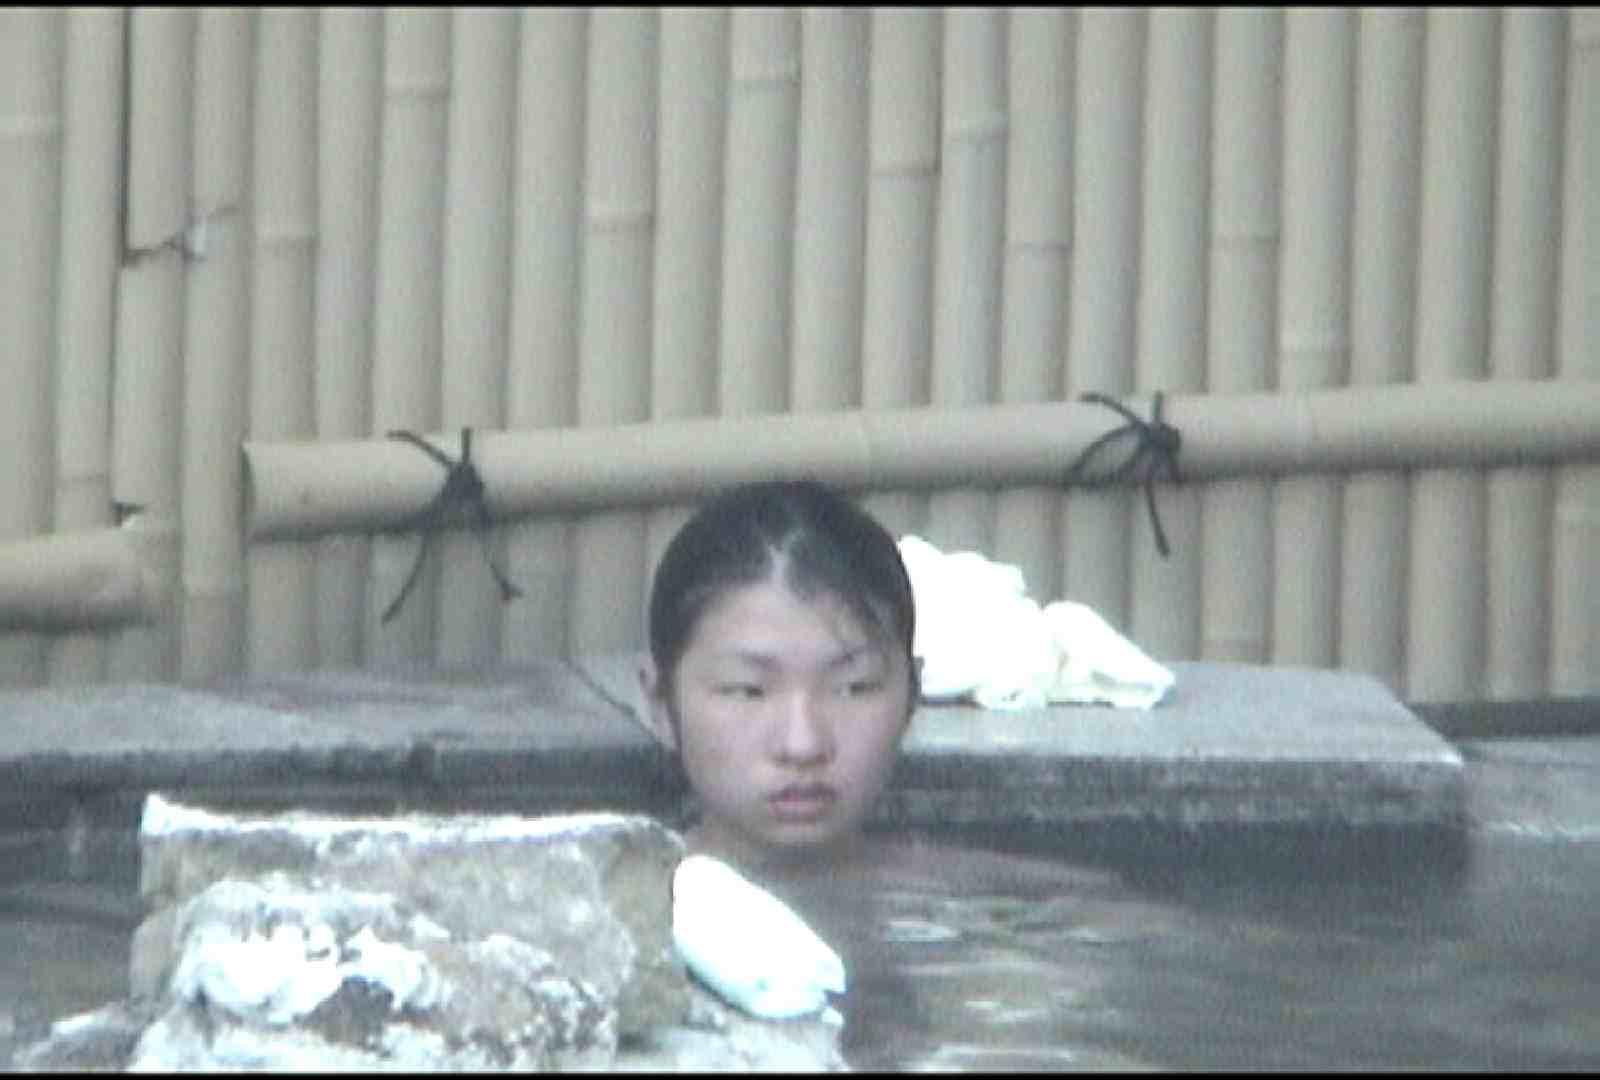 Aquaな露天風呂Vol.15 盗撮映像  42Pix 20